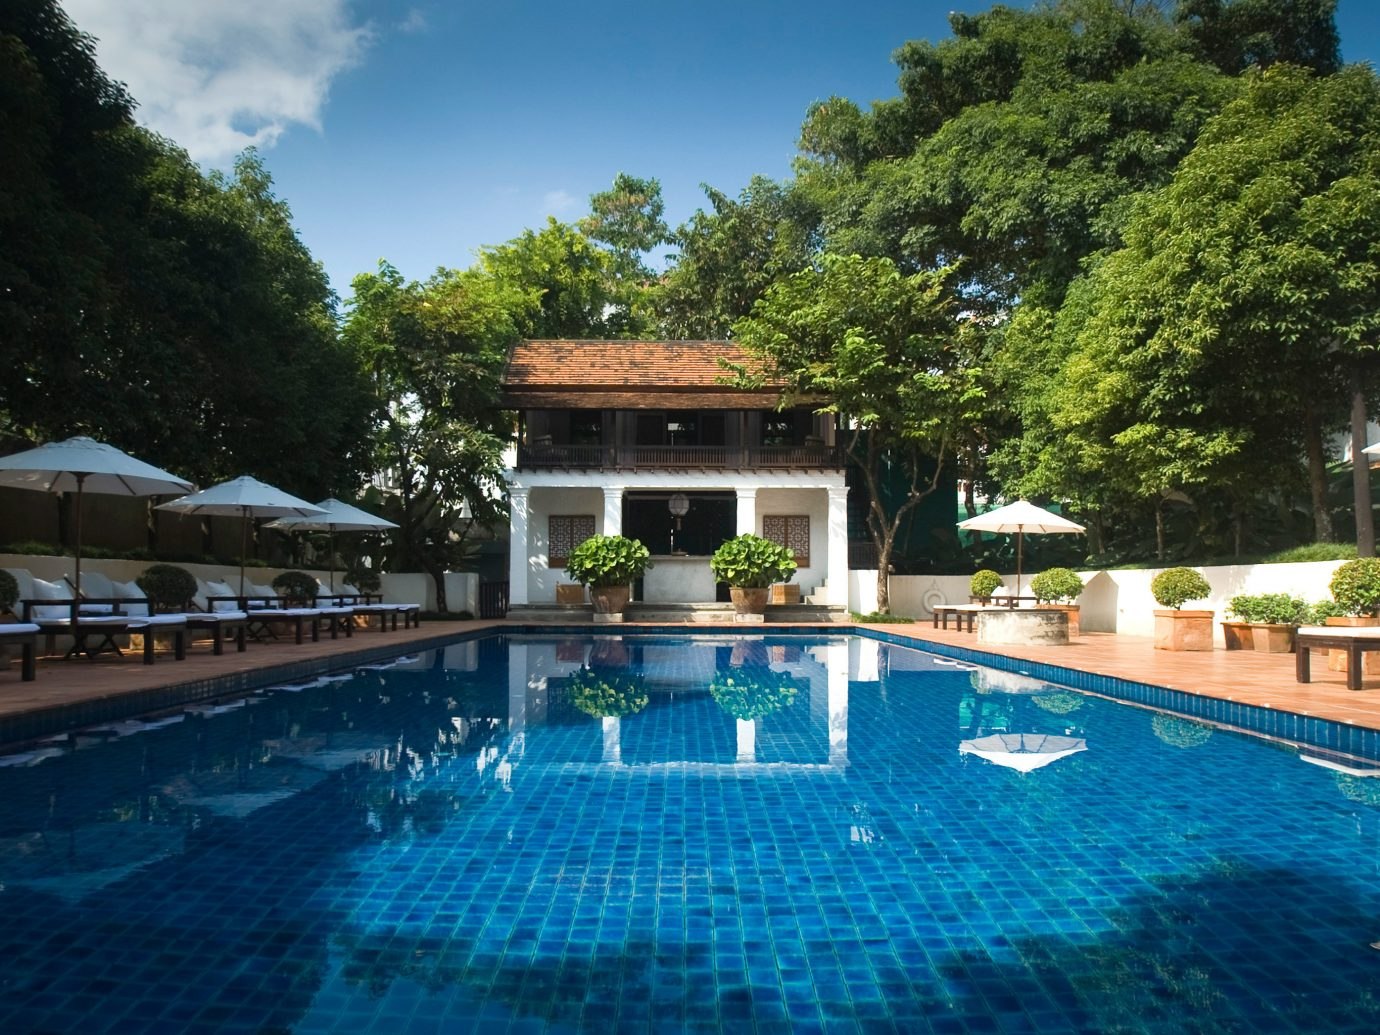 Elegant Hotels Jungle Patio Pool Romance tree outdoor swimming pool Resort property water sport estate reflecting pool resort town Villa backyard real estate mansion swimming blue